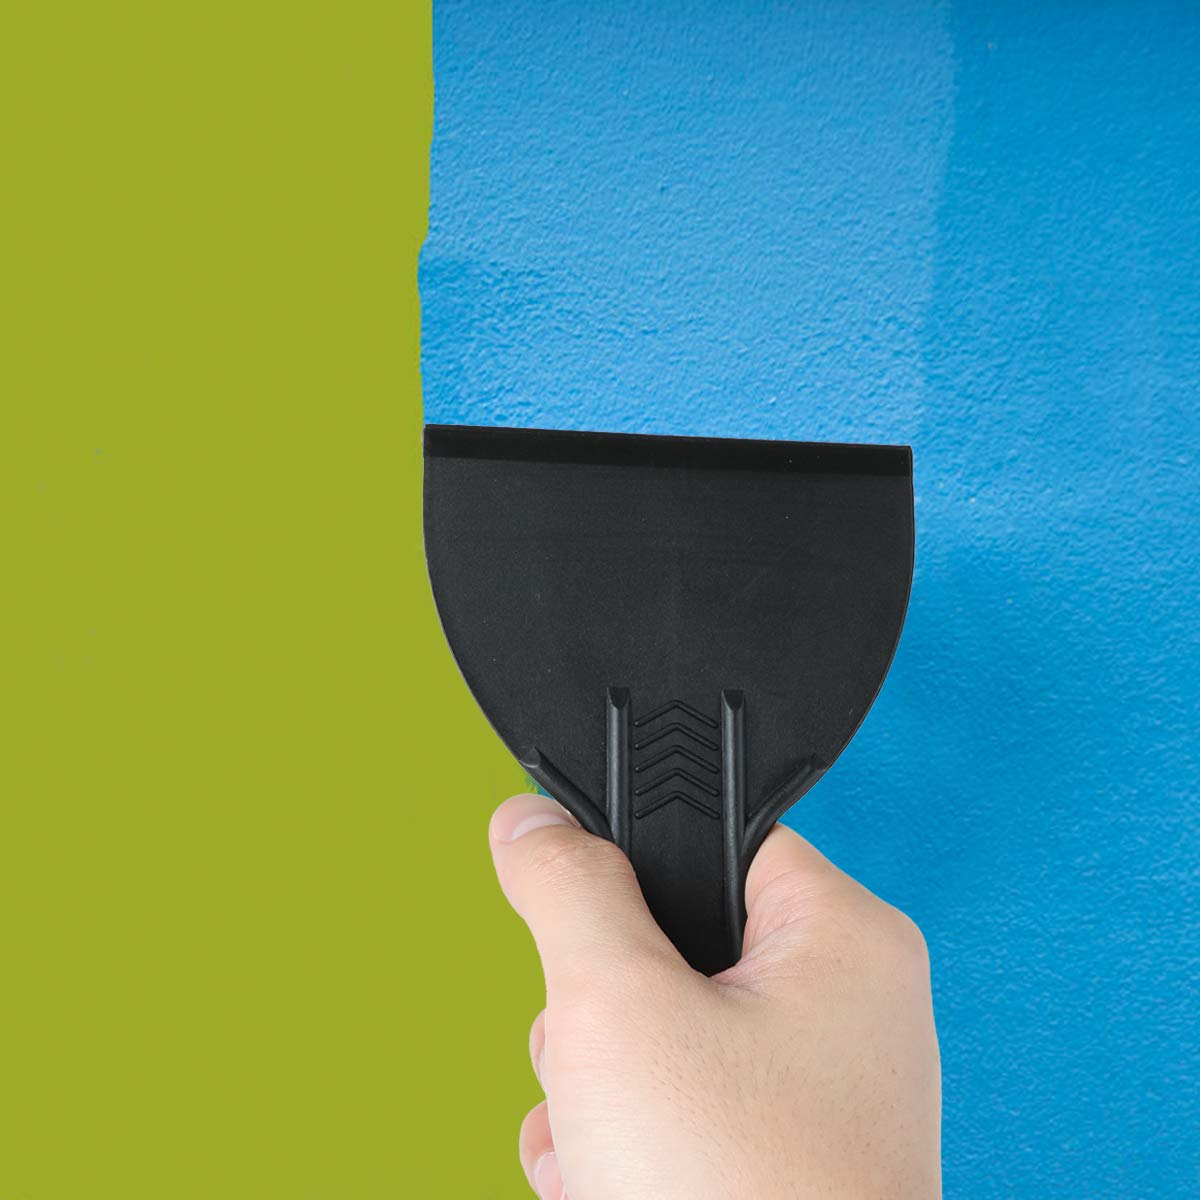 Set di spatole per stucco in plastica flessibile AIEVE muri per decalcomanie carta da parati stucco auto patch e pittura spackling nero, 5 pezzi